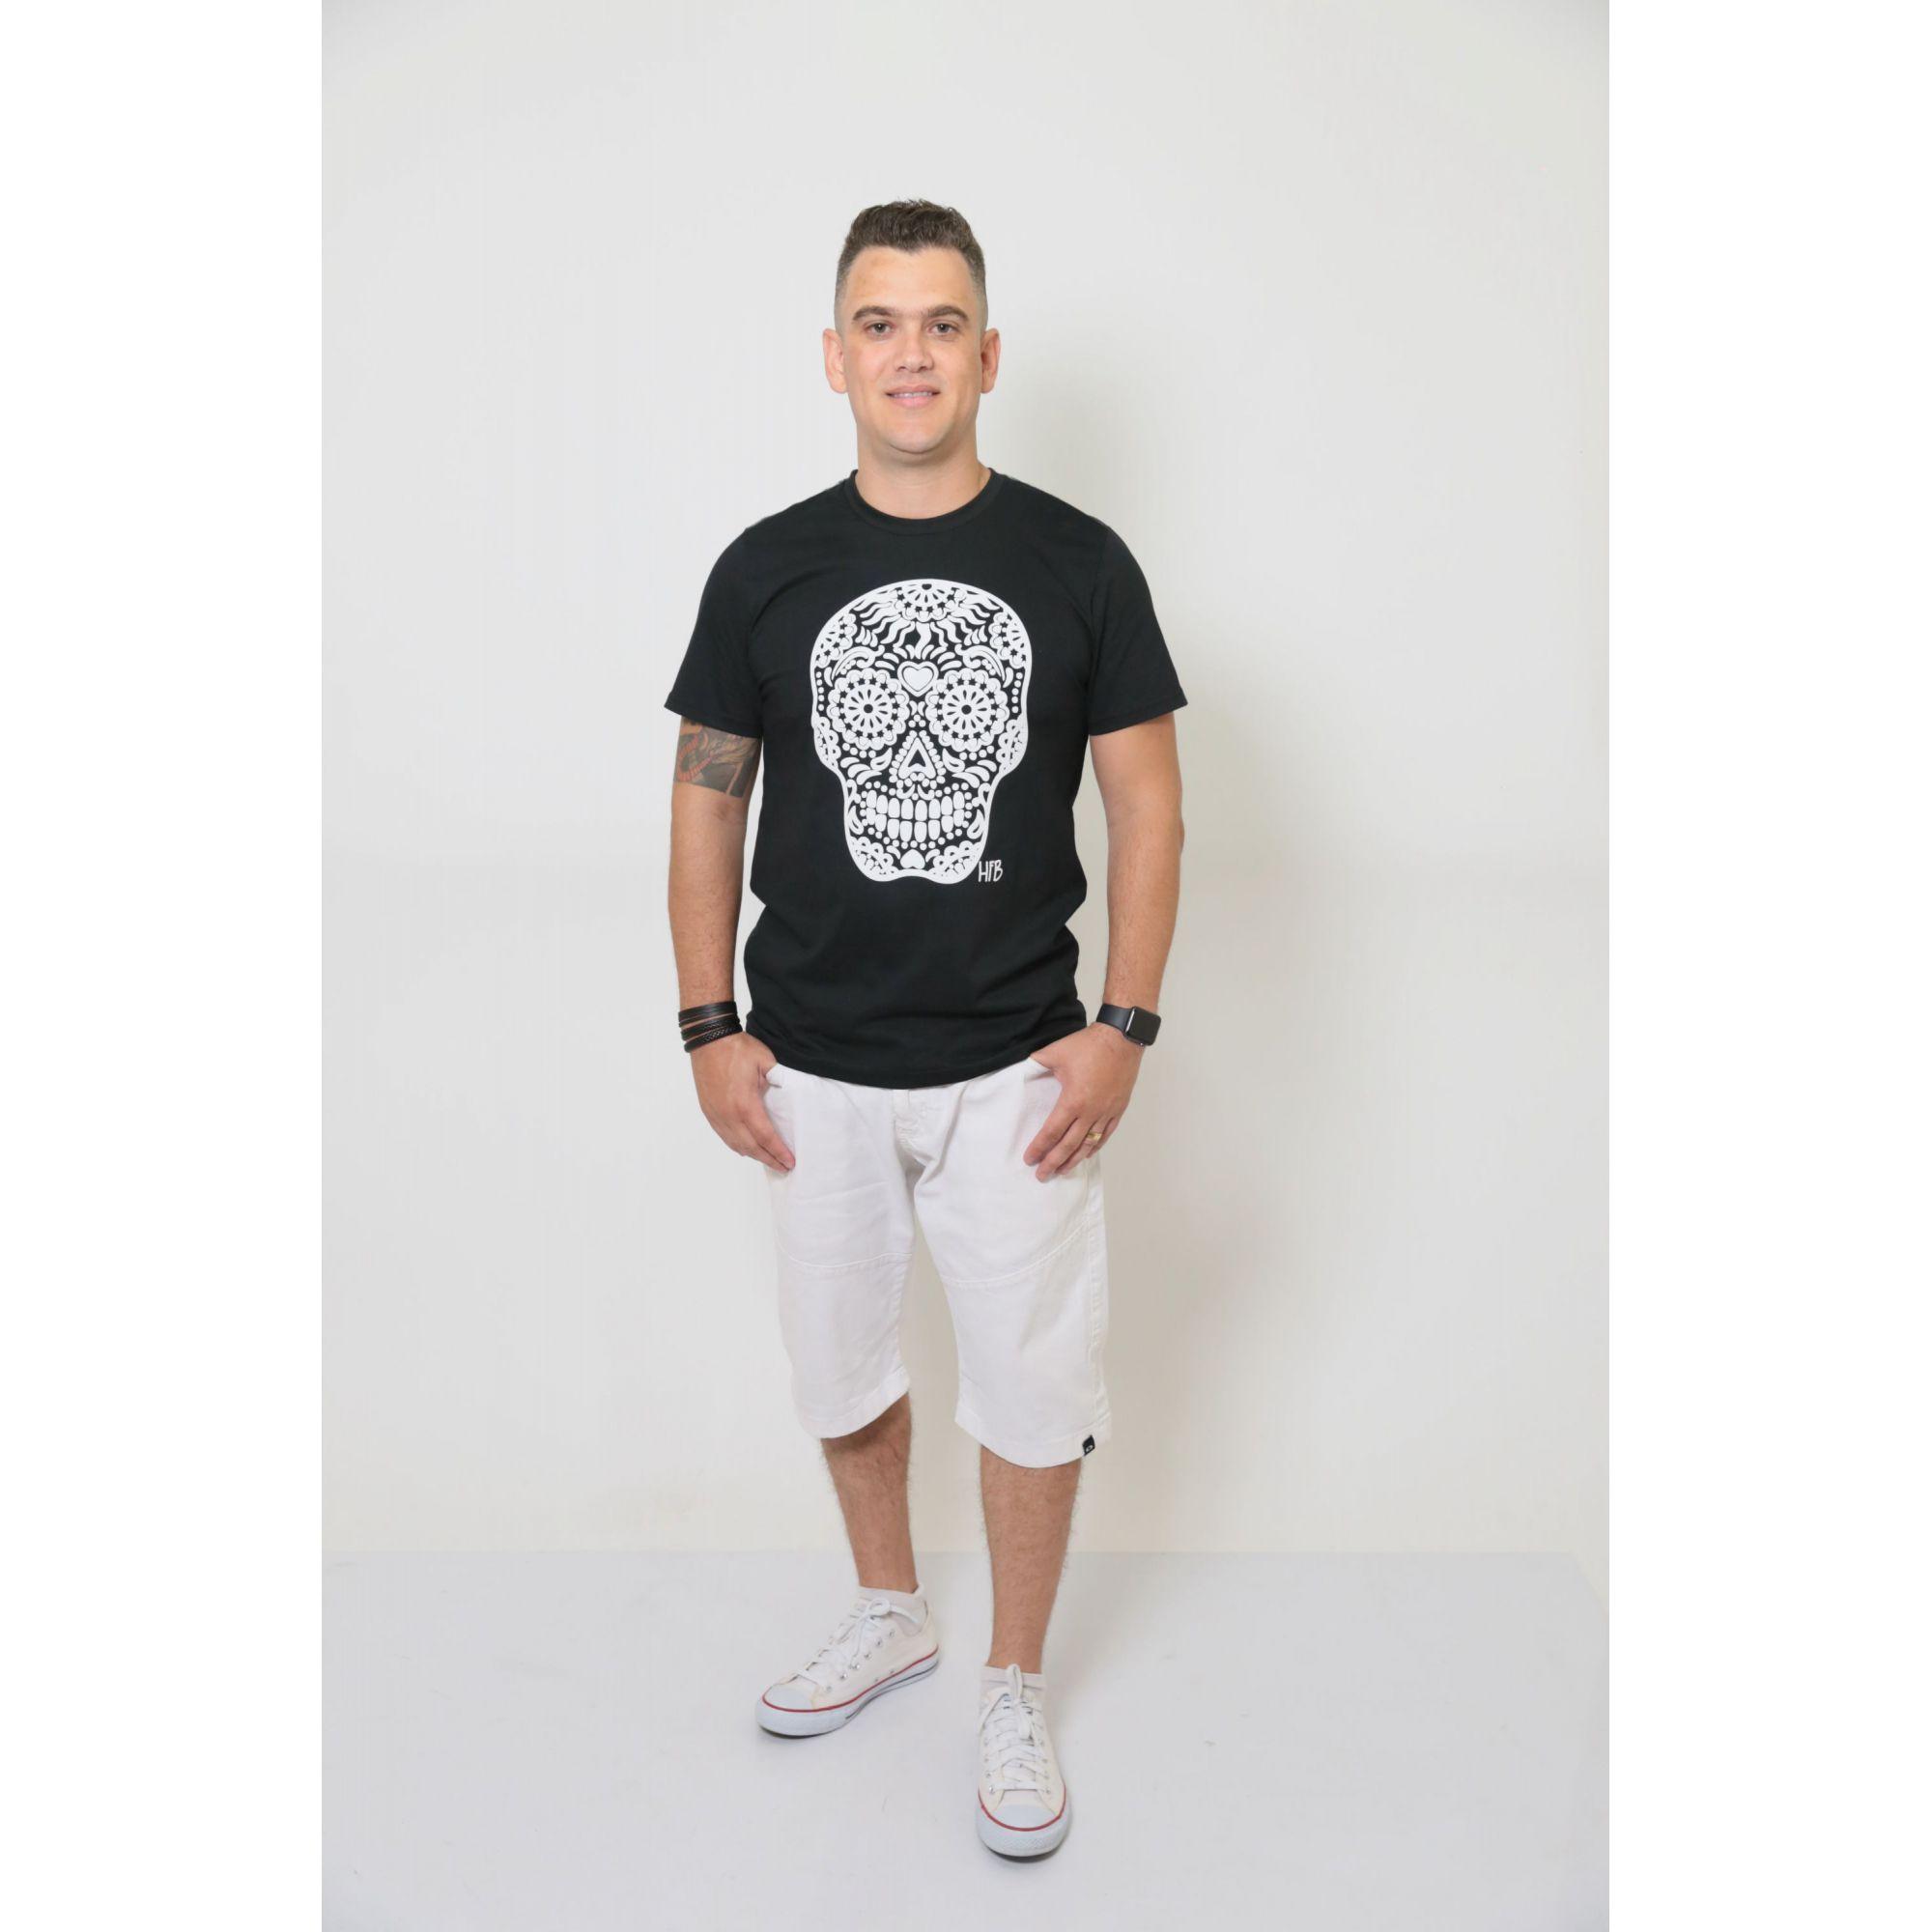 Camiseta Masculina Preta Caveira Alto Relevo